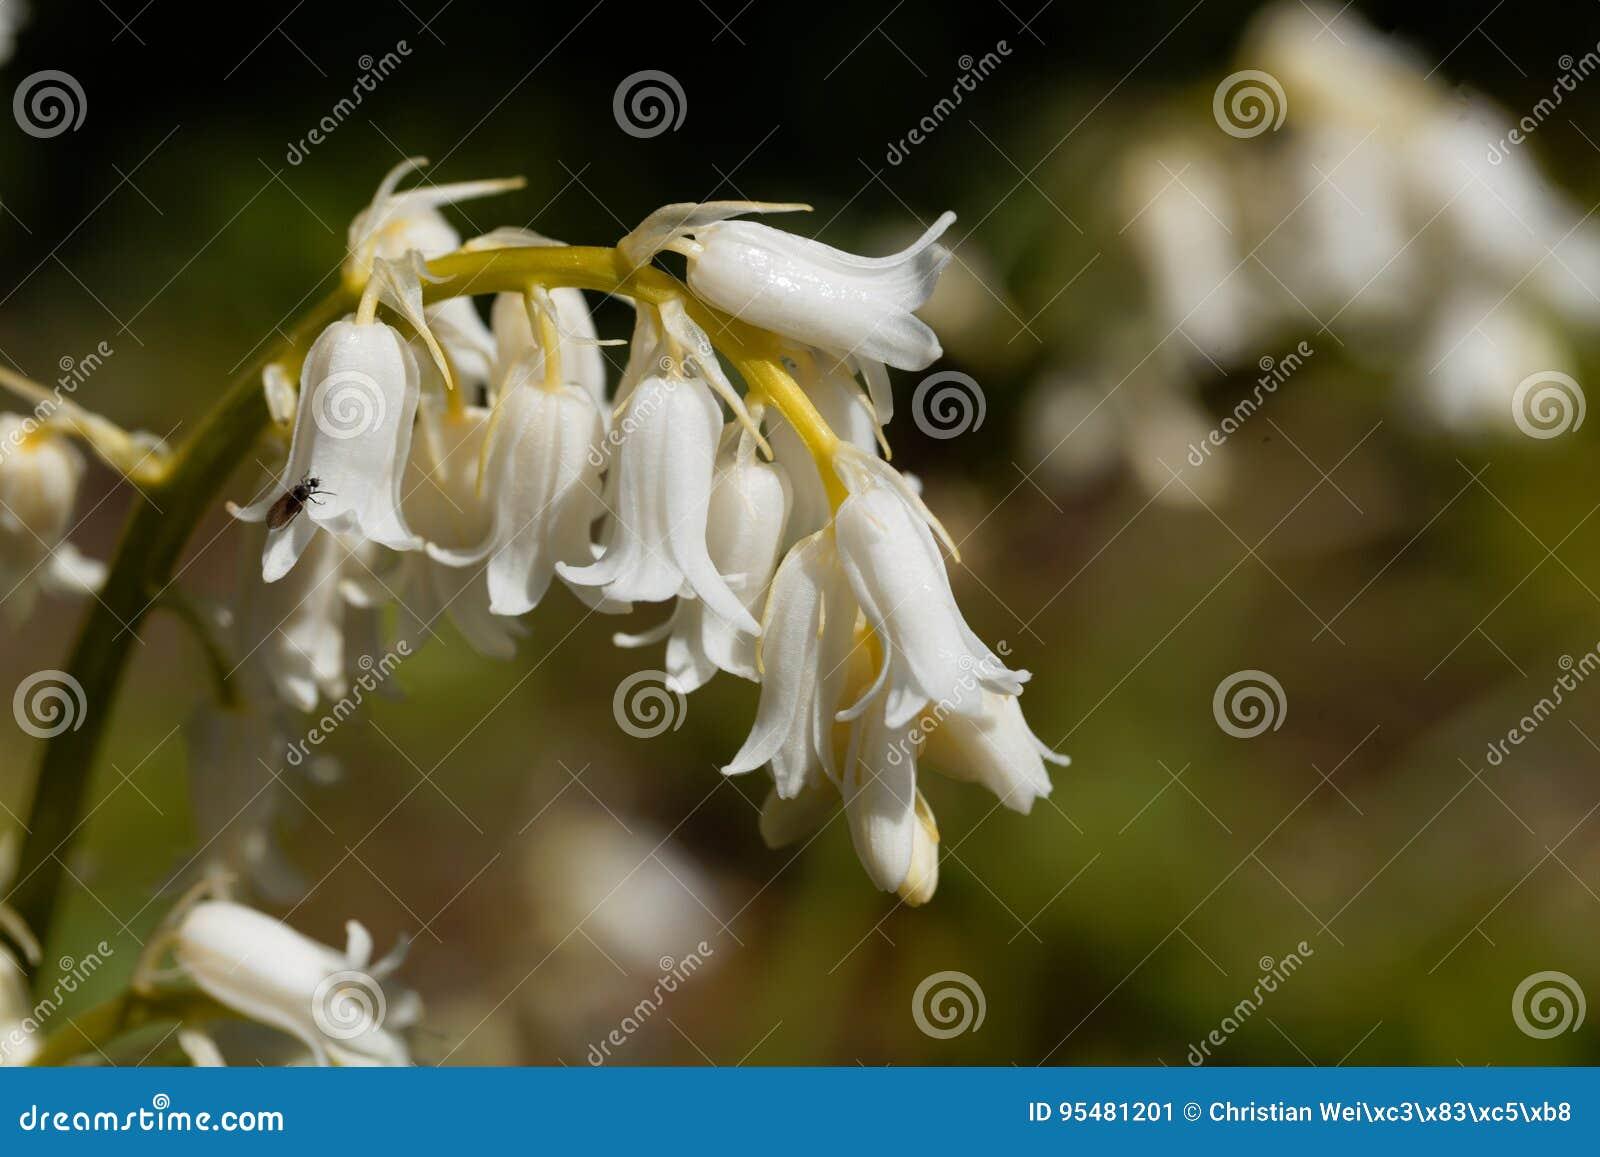 Hiszpański bluebell hyacinthoides hispanica